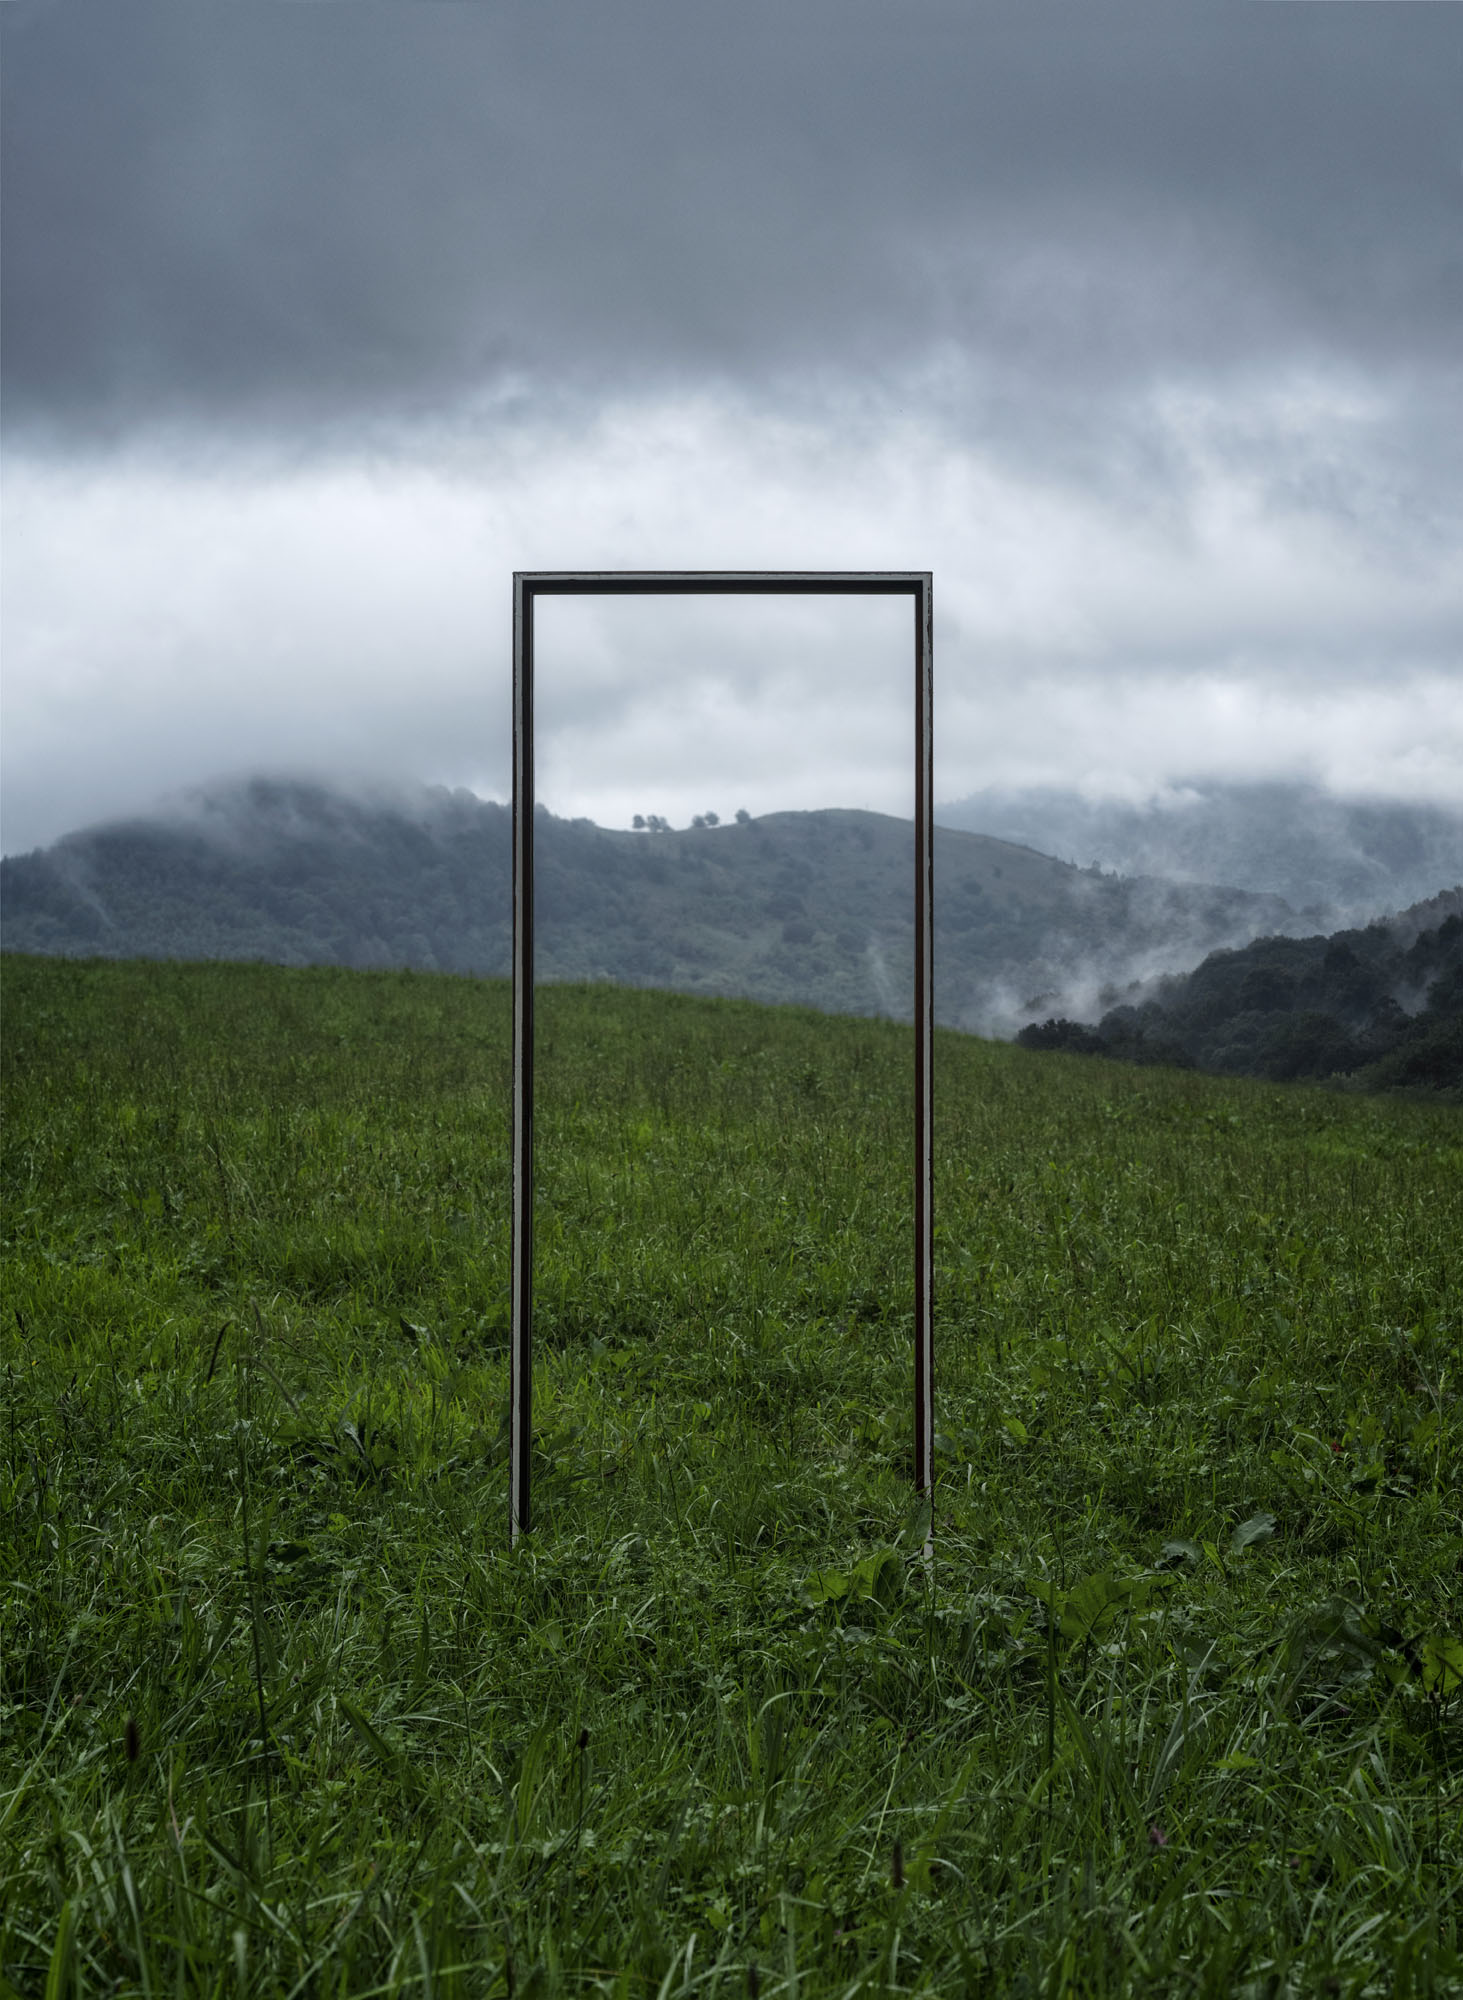 Puertas que reabren, mentes que despiertan